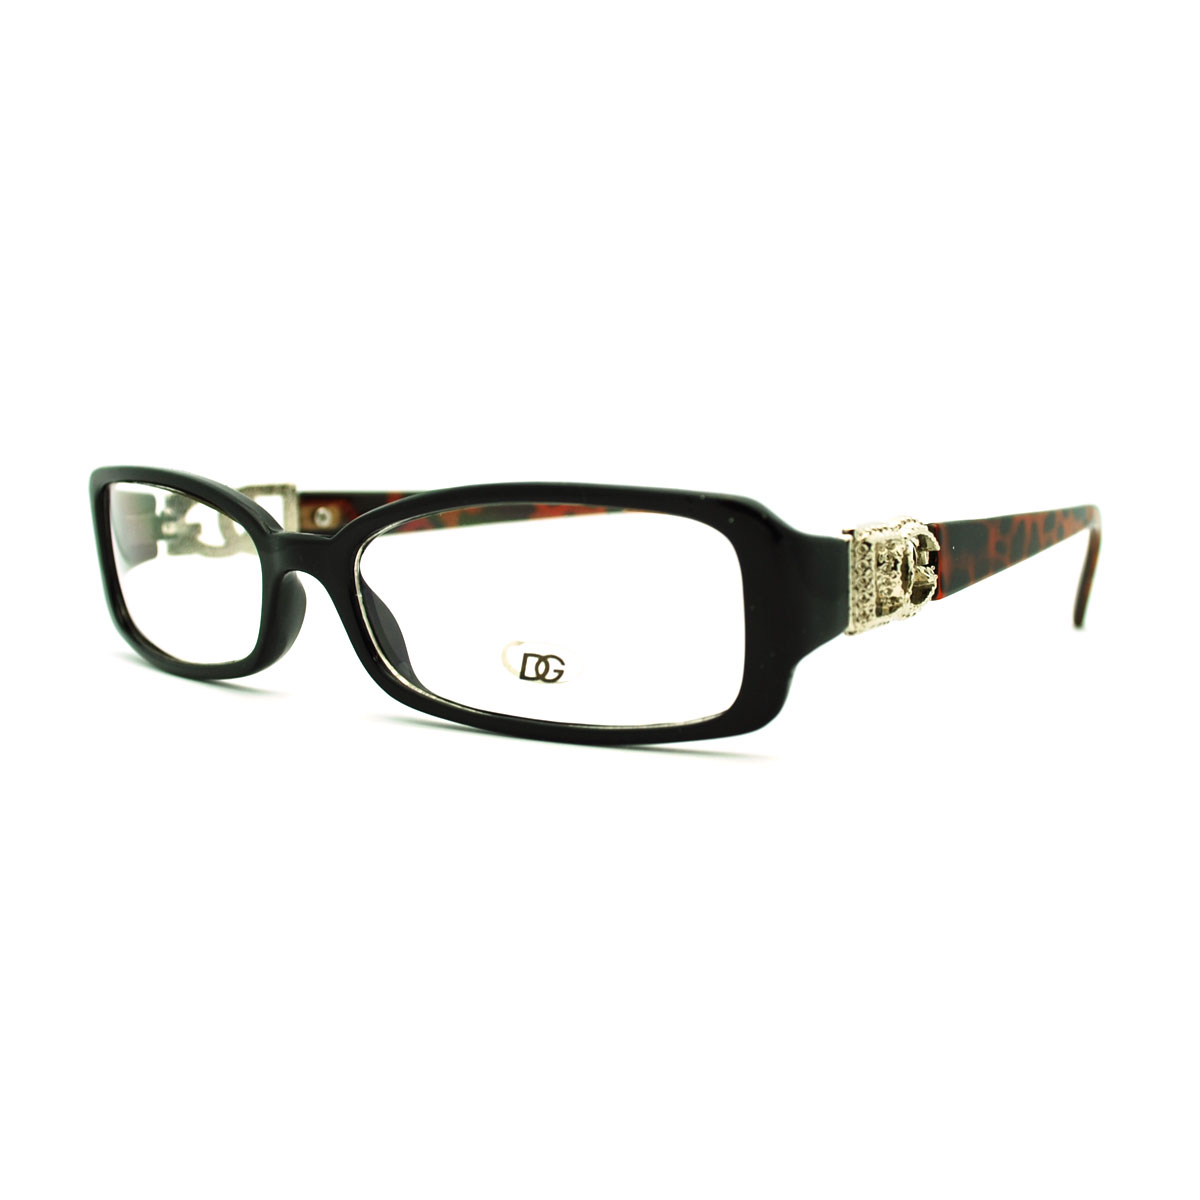 Narrow Frame Reading Glasses : Womens Sexy Extra Narrow Rectangular Plastic Frame Eye ...